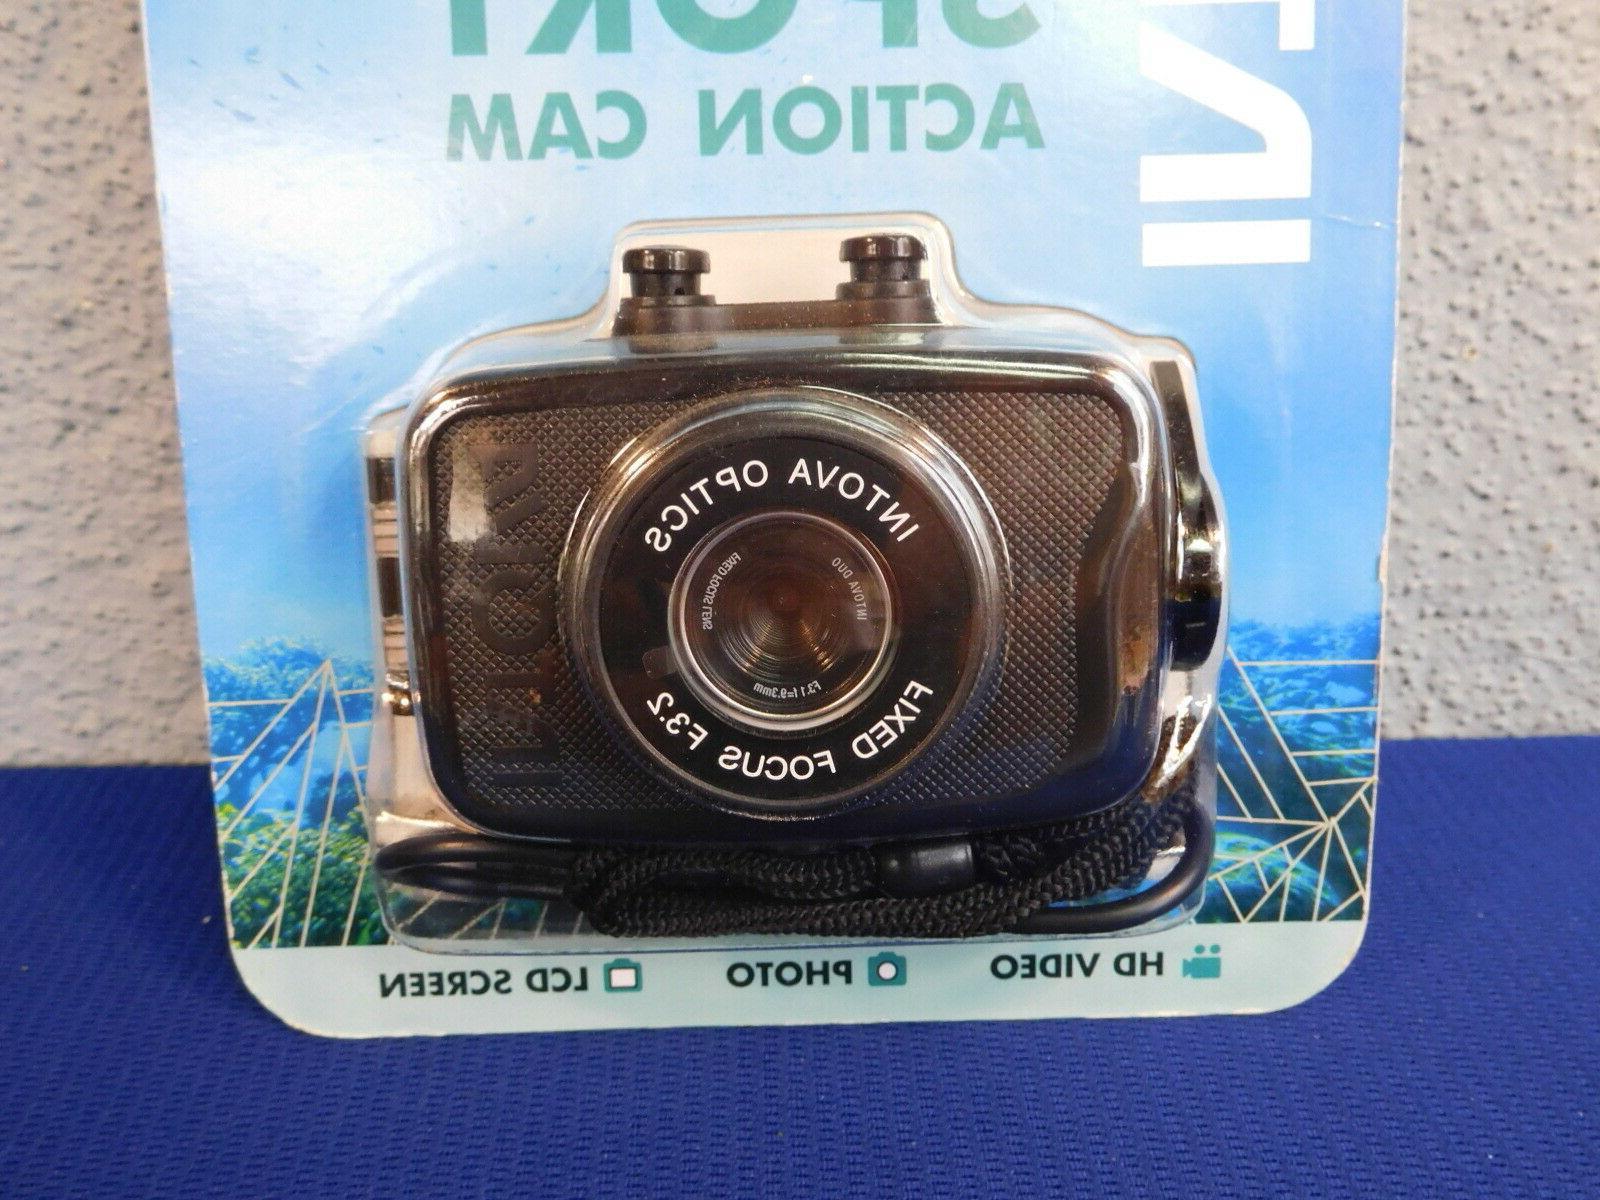 Intova Camera LCD New Package Waterproof 100'